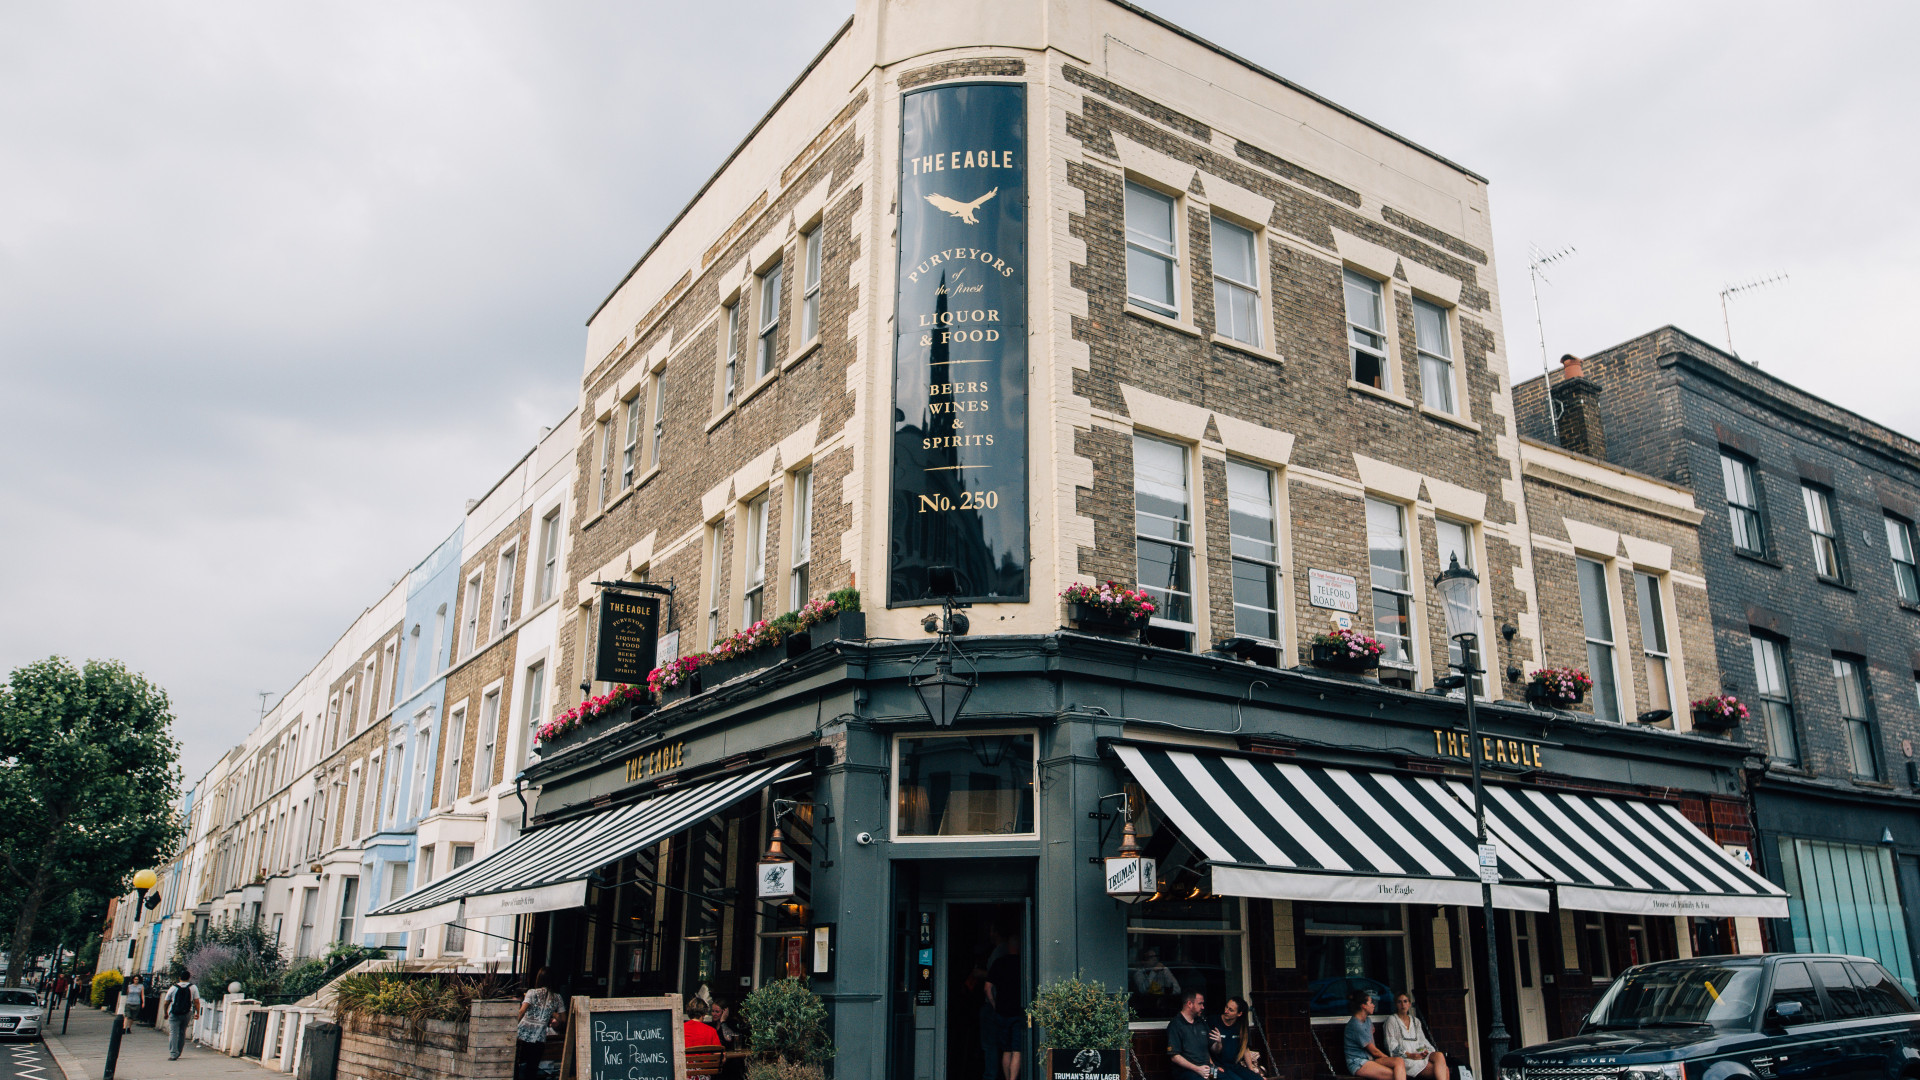 The Eagle, Ladbroke Grove